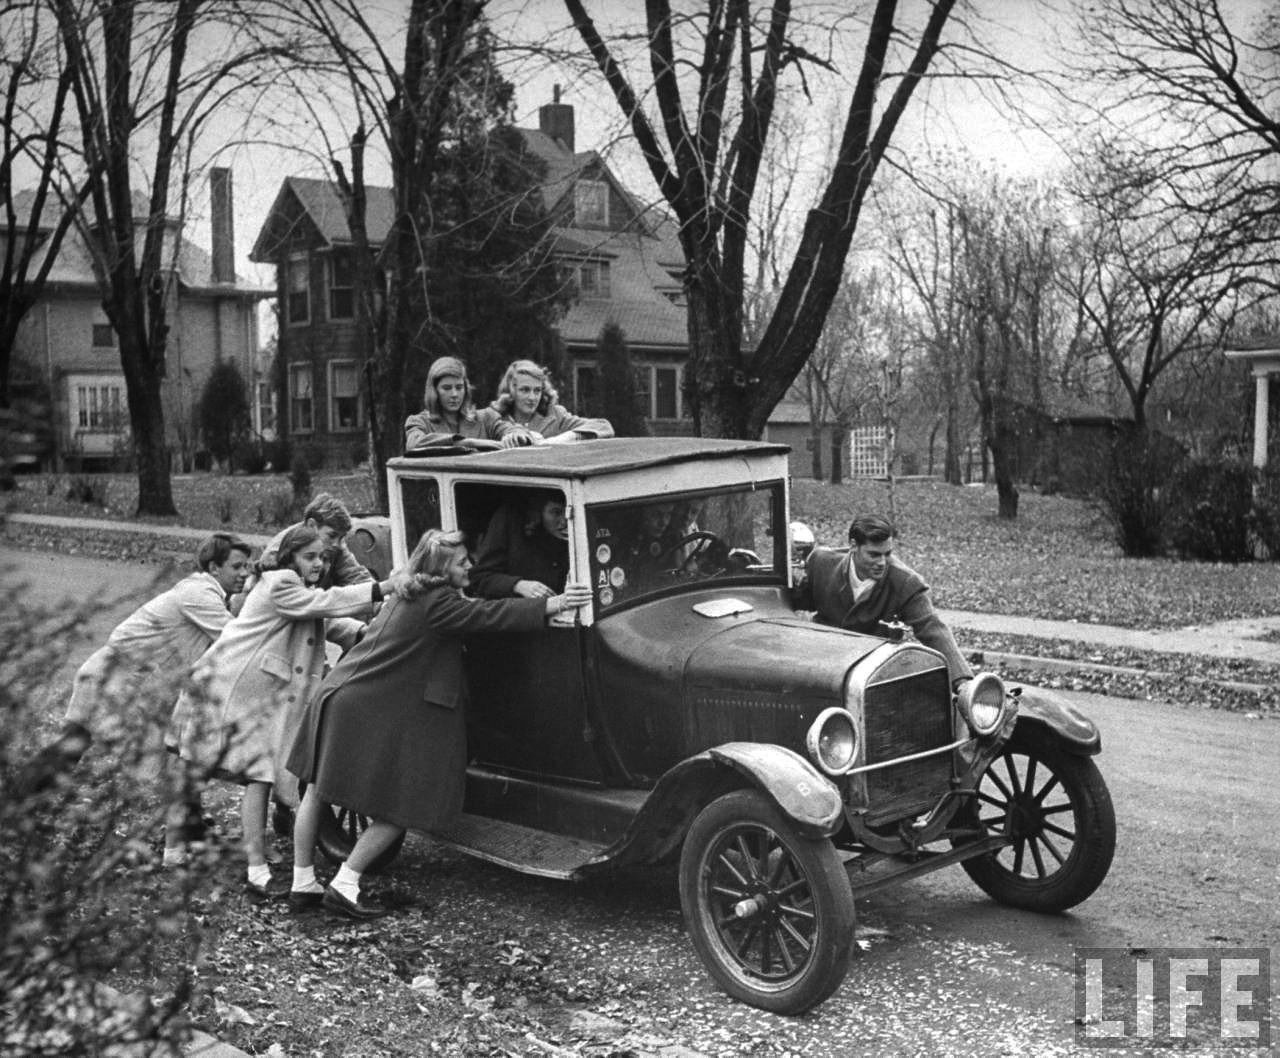 Nina Leen: Group of teenagers pushing an old car. St Louis, 1944 ...